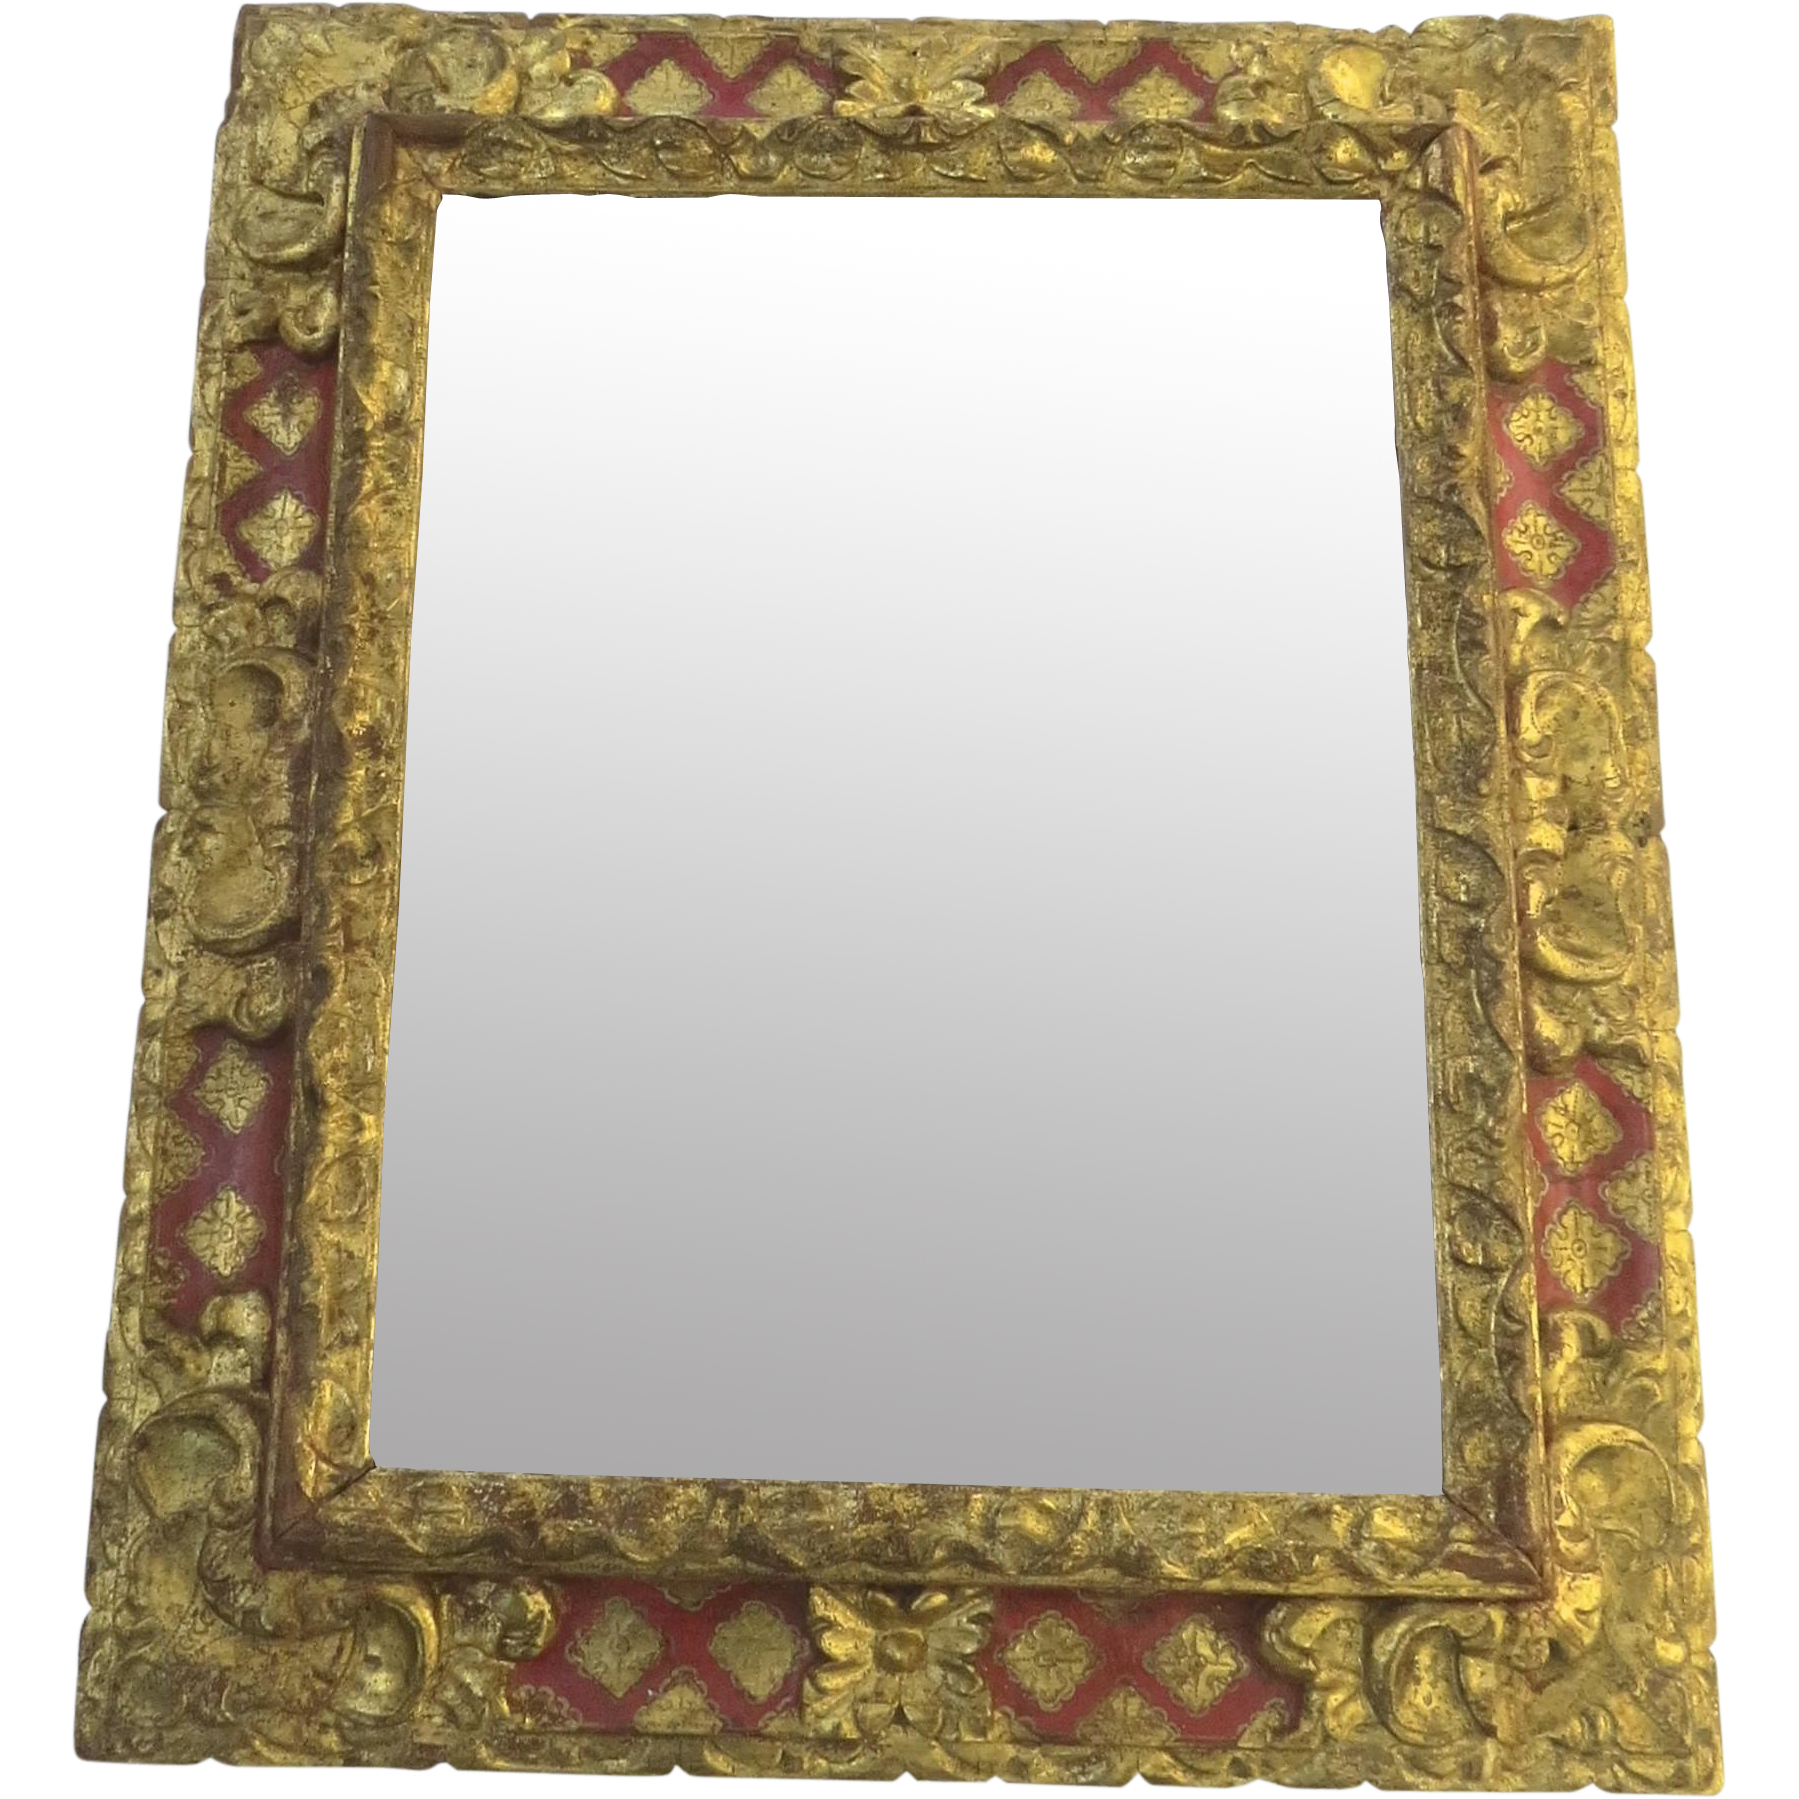 Late 18th century italian baroque mirror from blacktulip for Italian baroque mirror